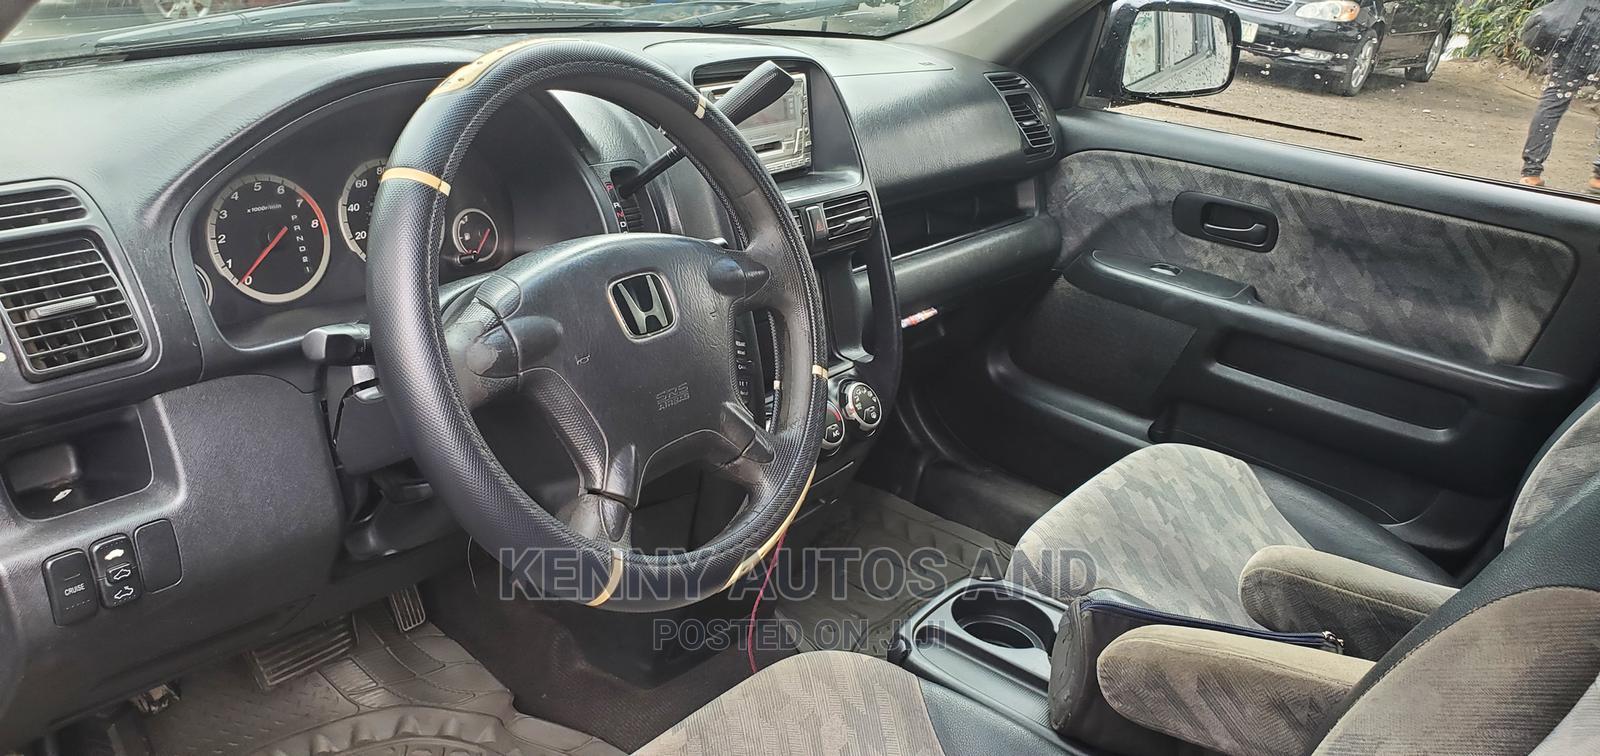 Honda CR-V 2004 Black   Cars for sale in Surulere, Lagos State, Nigeria